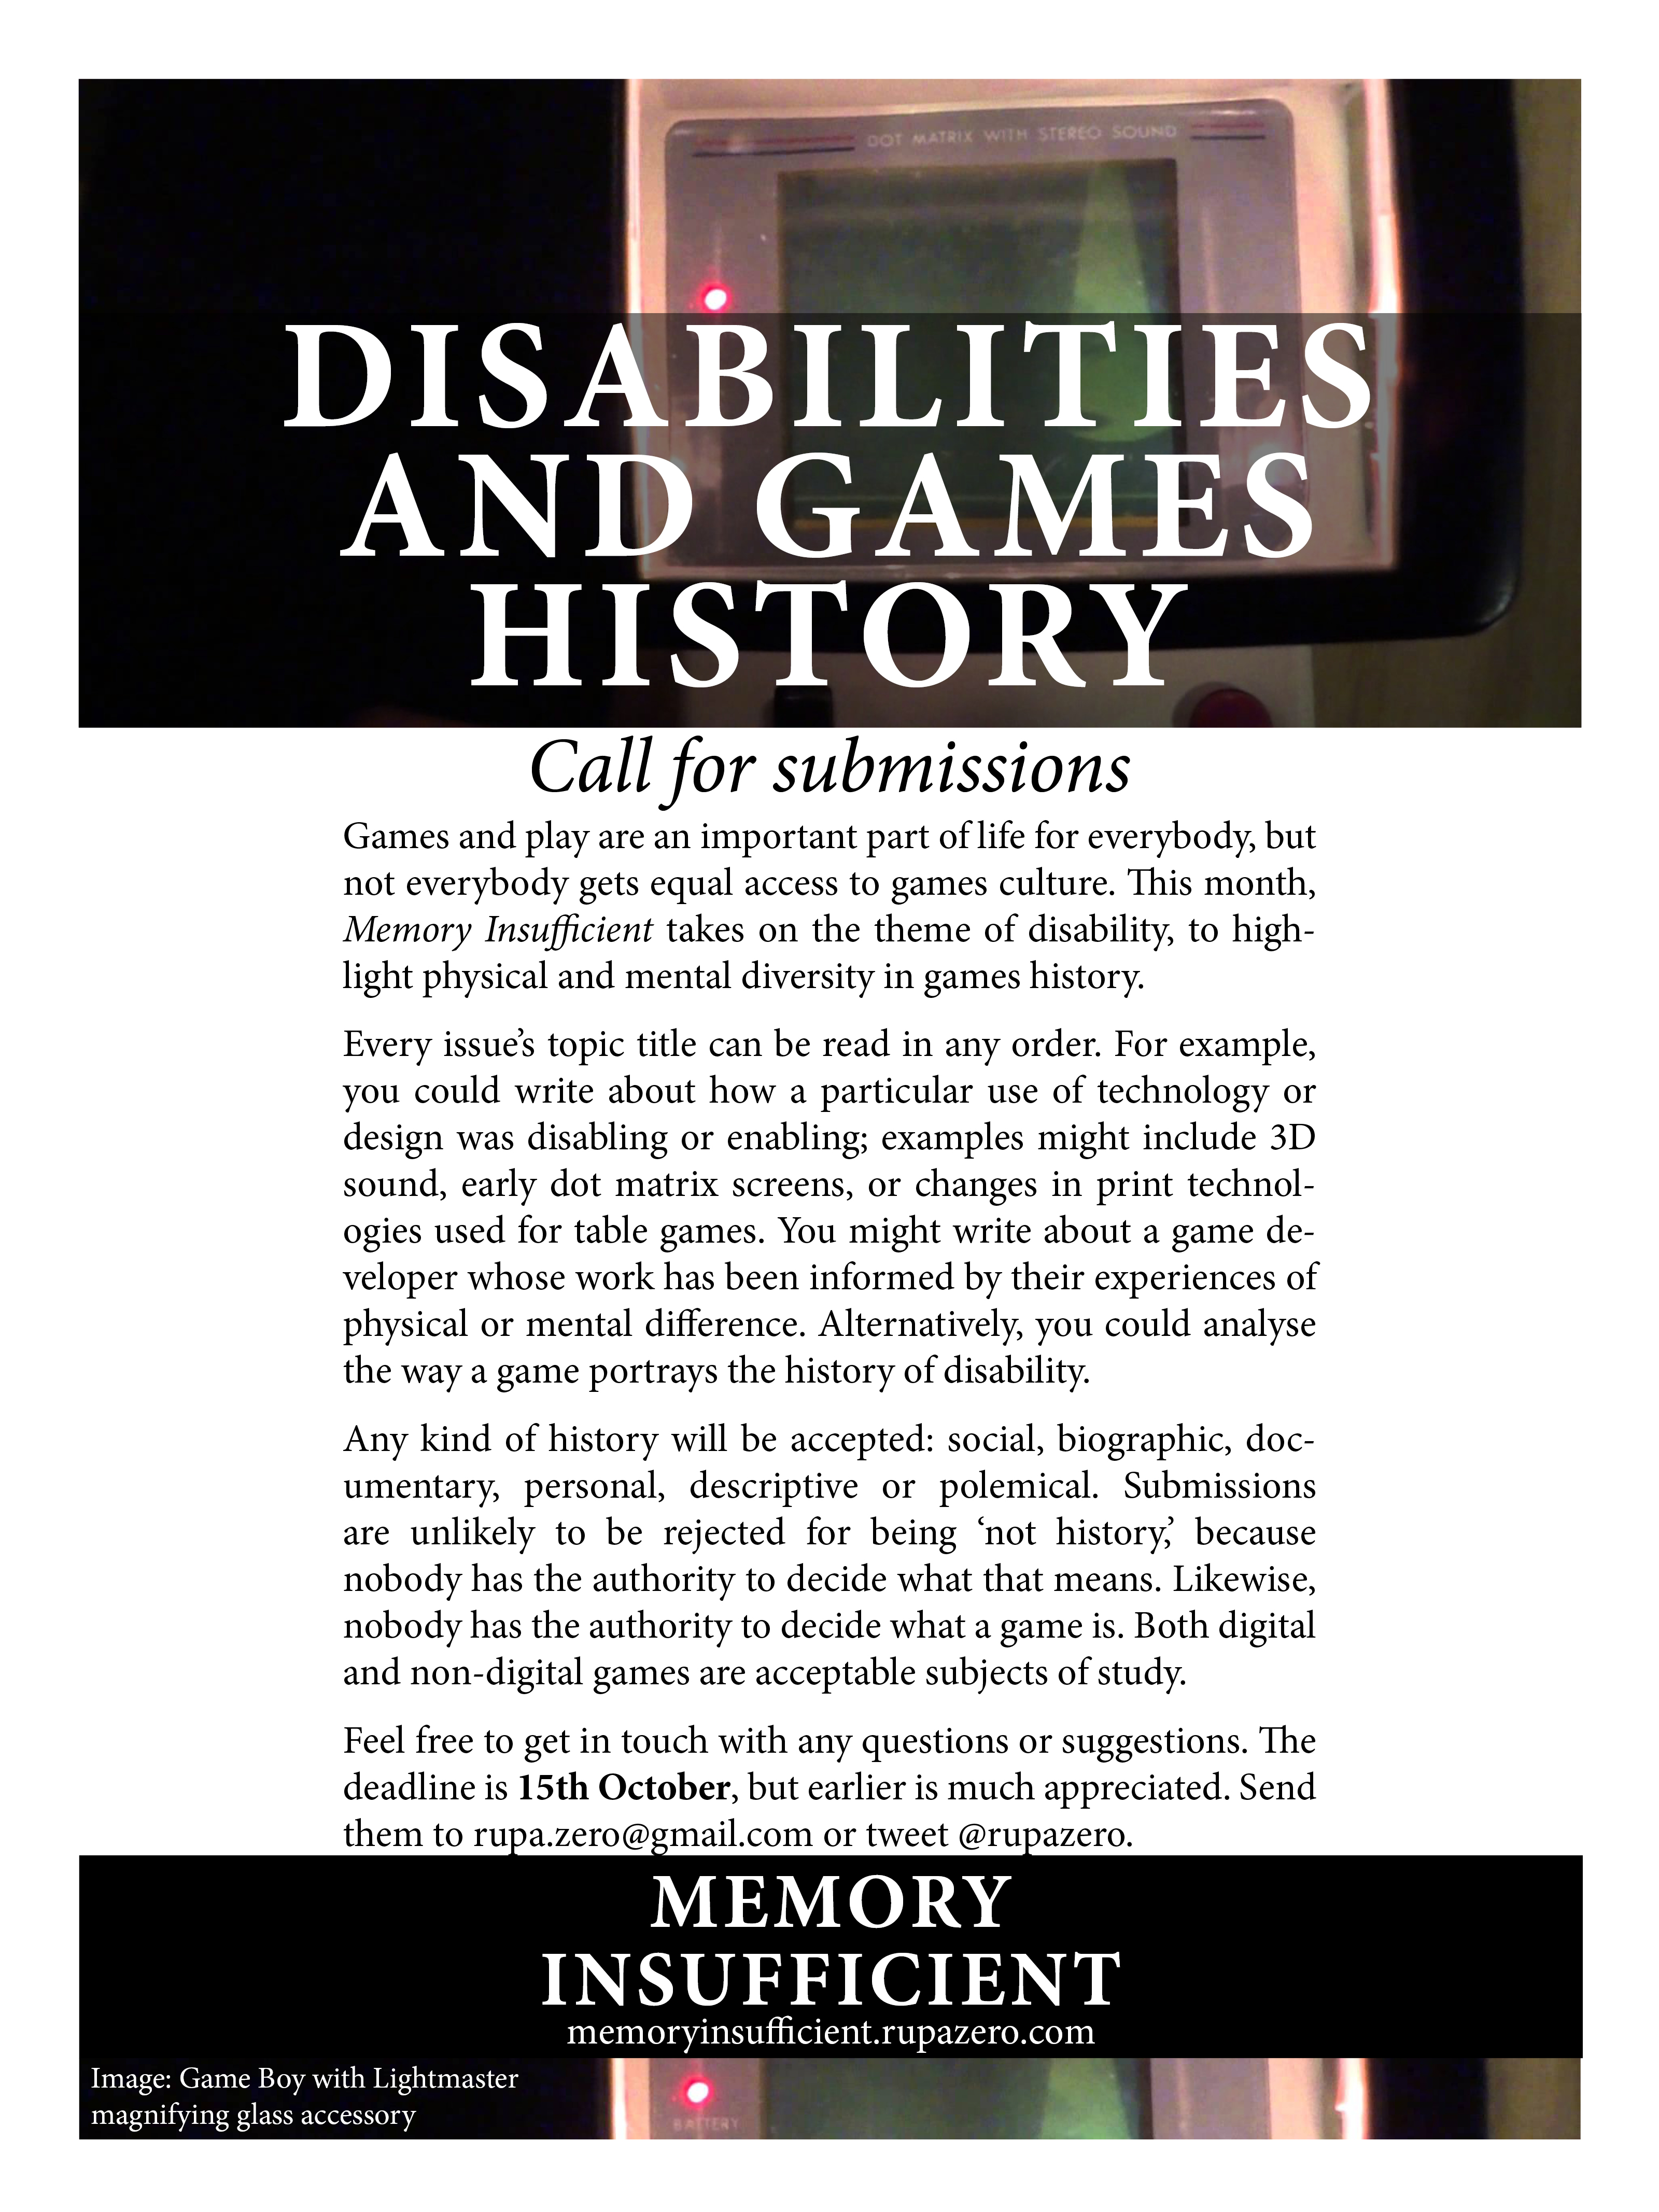 Memory-Insufficient-CFS-disabilities